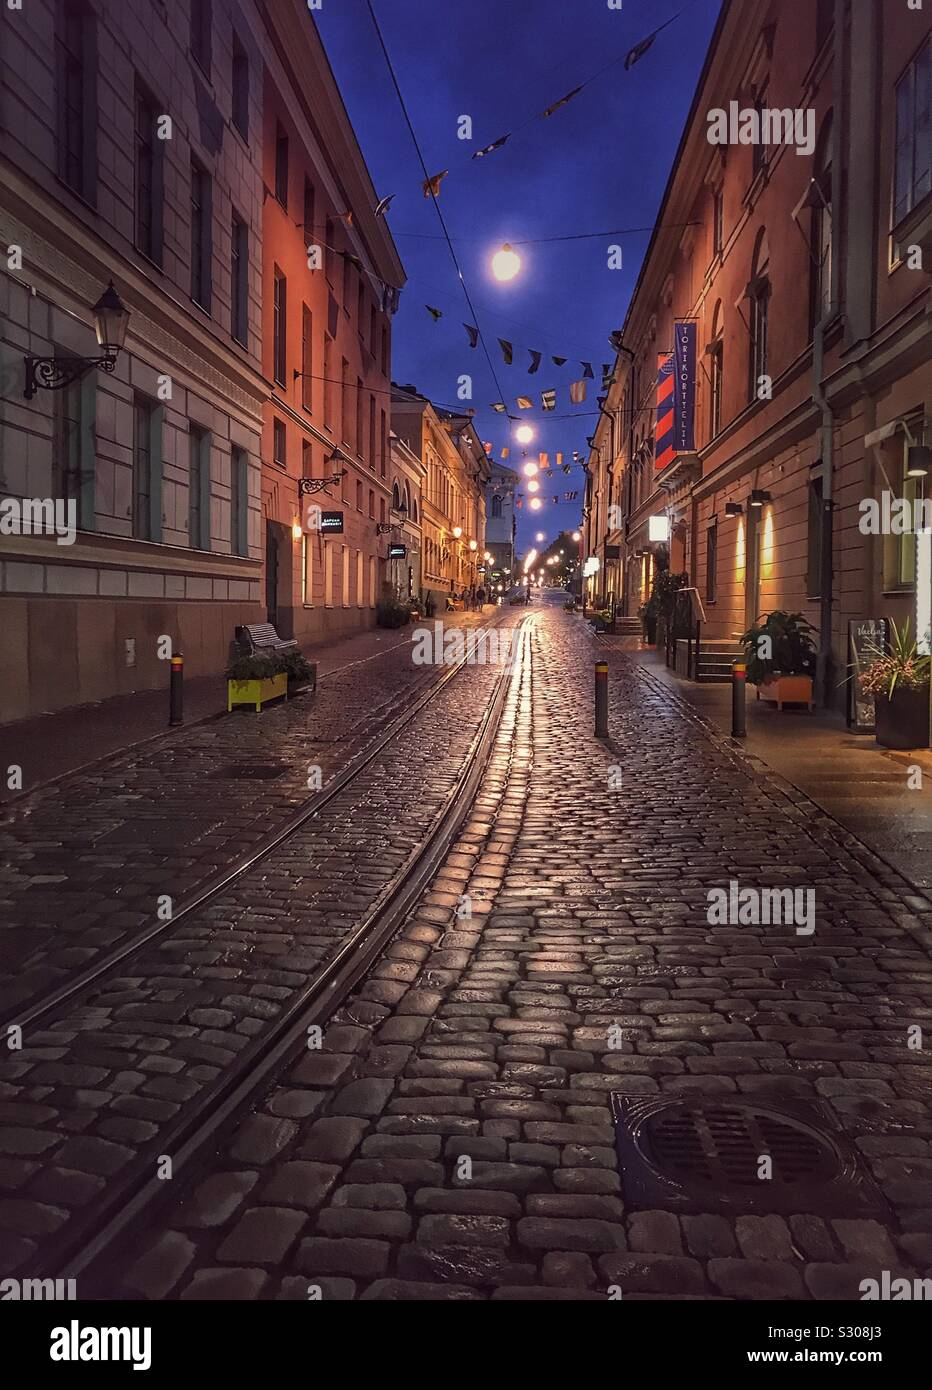 Un paseo nocturno a través de Helsinki, Finlandia. Foto de stock